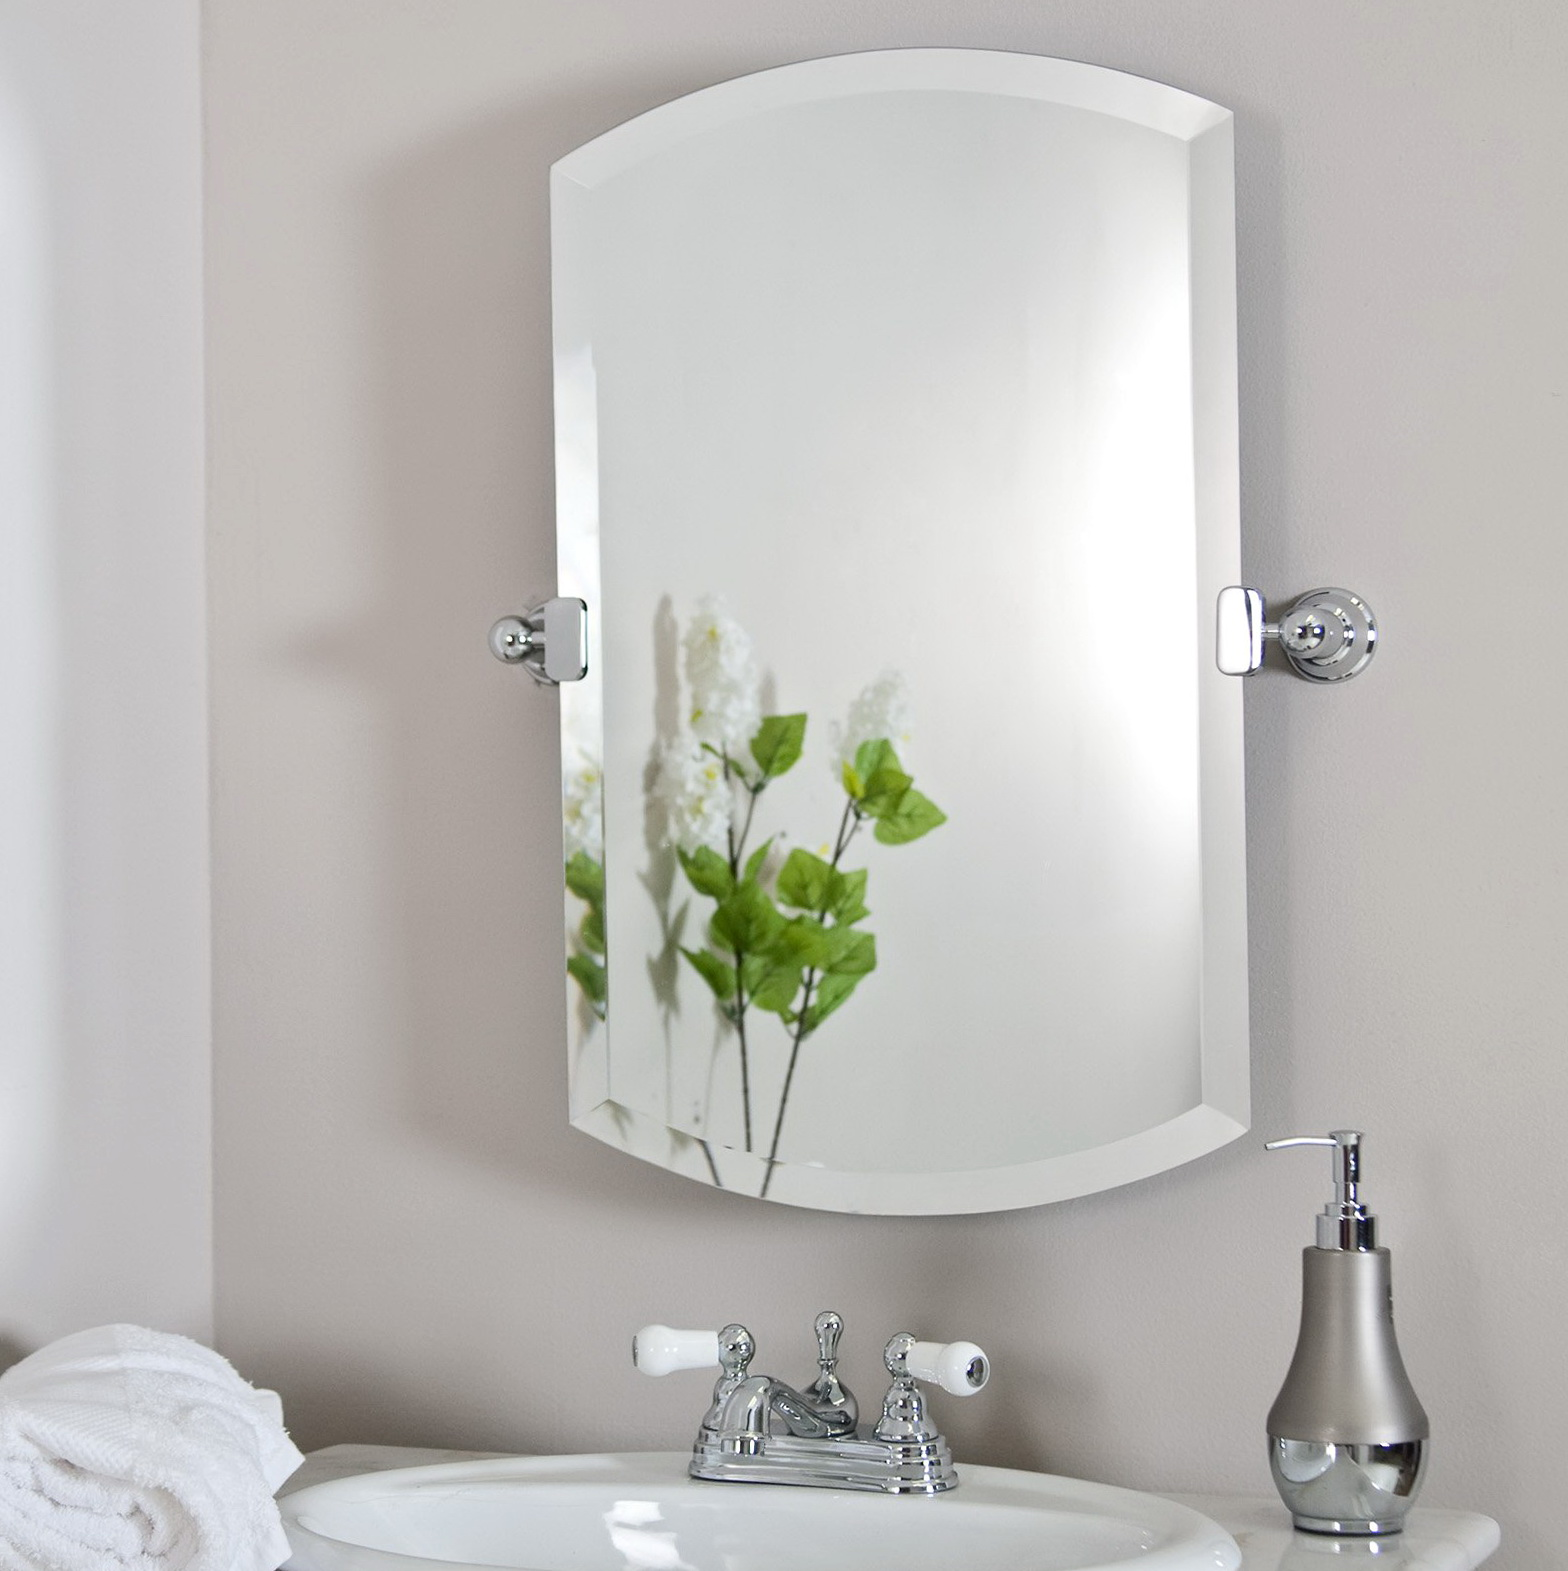 Bathroom Mirror Cabinets India